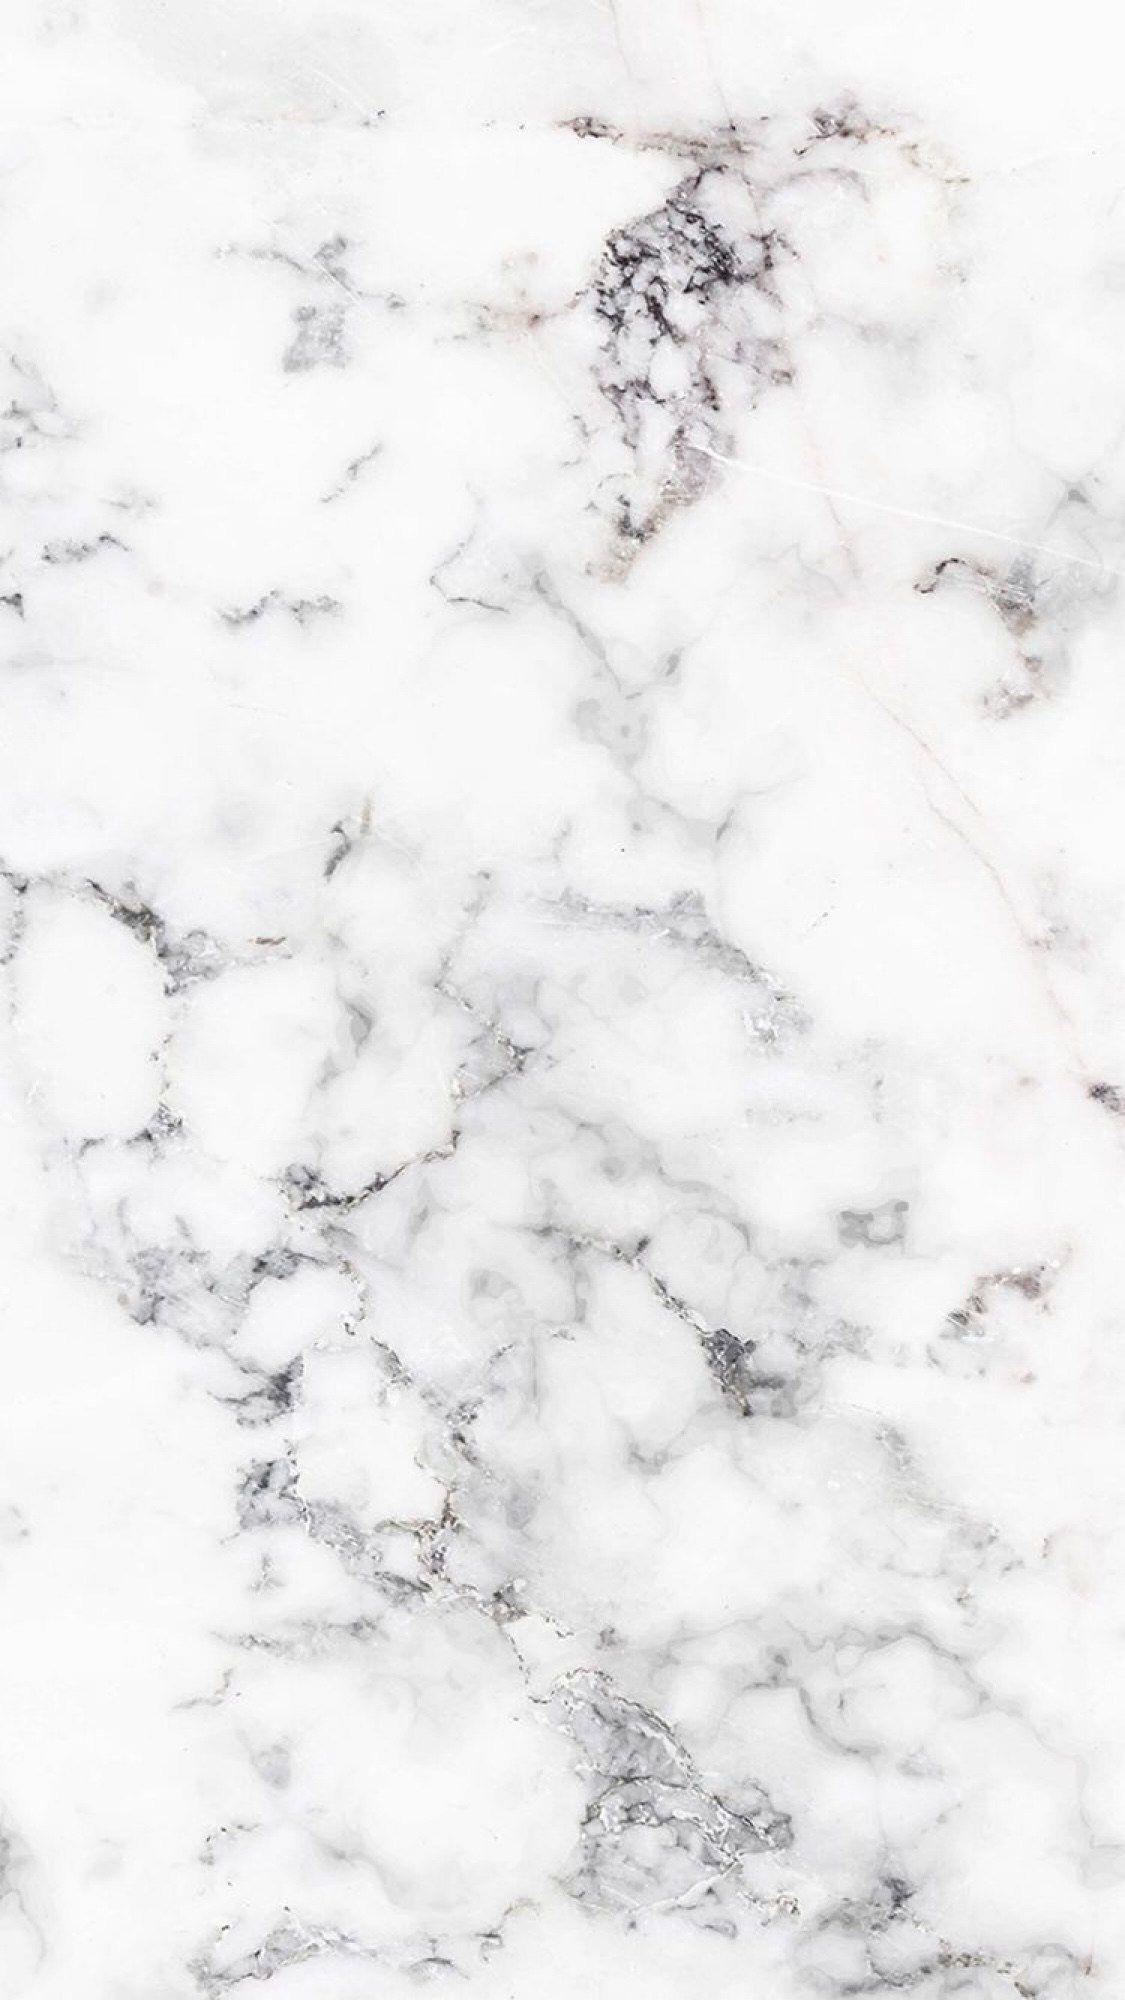 White Monochrome Blackandwhite Marble Iphone Wallpaper Pinterest Marble Iphone Wallpaper Iphone Background Wallpaper